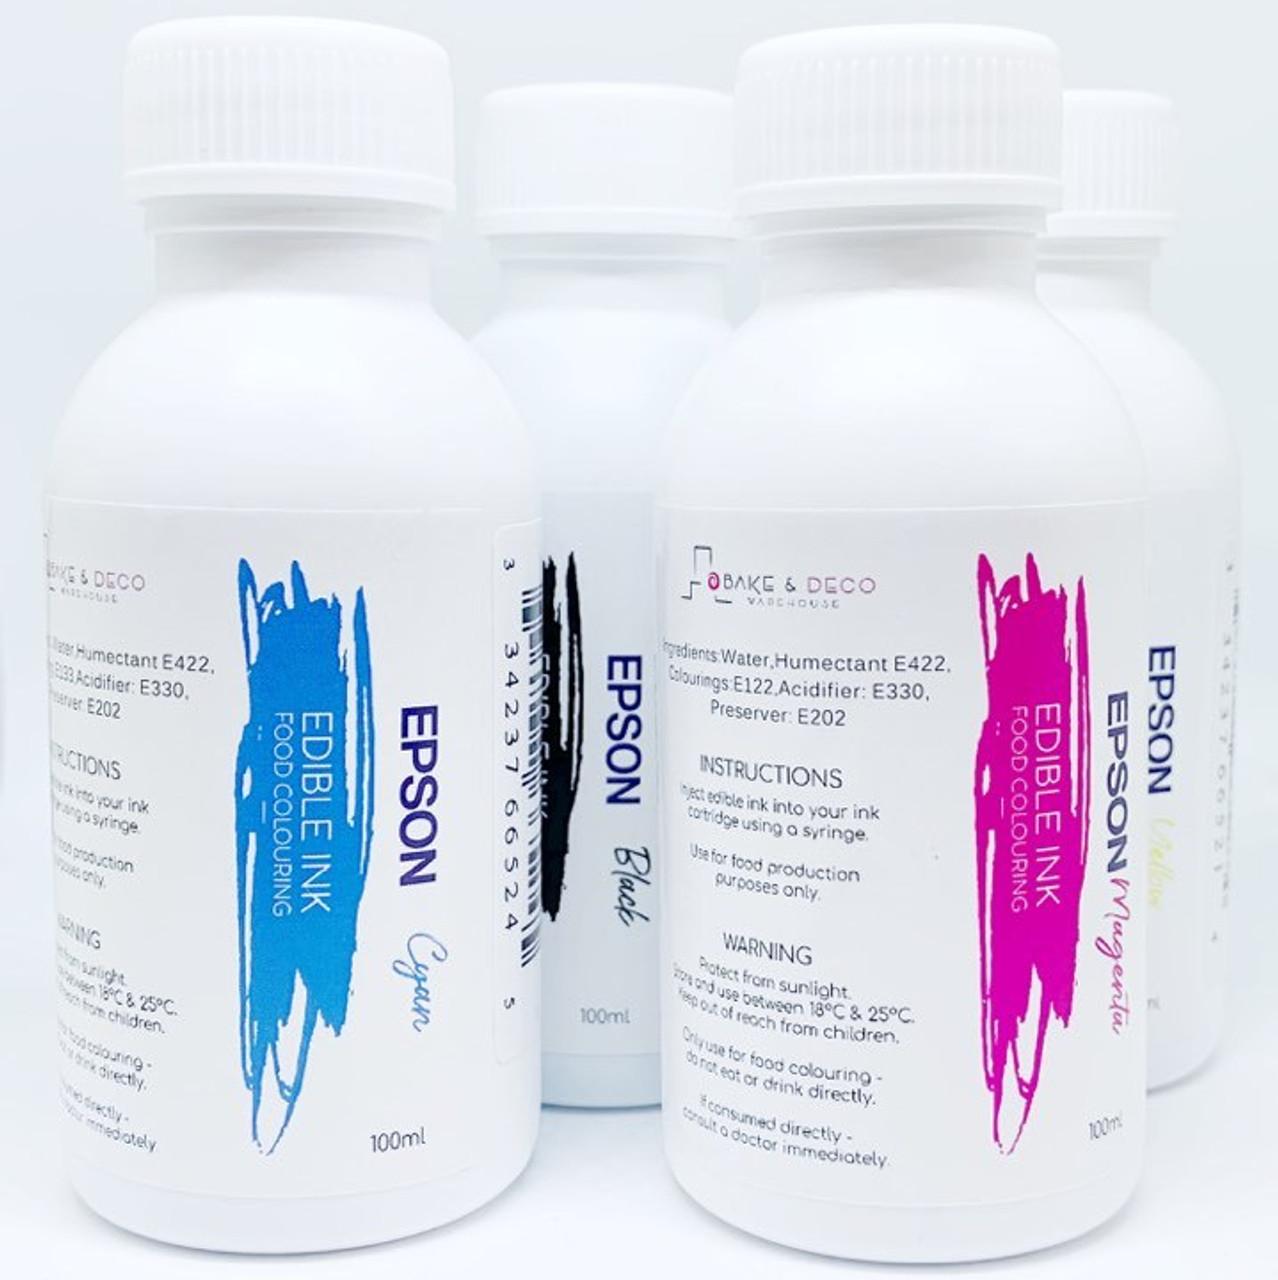 EPSON INK REFILLS